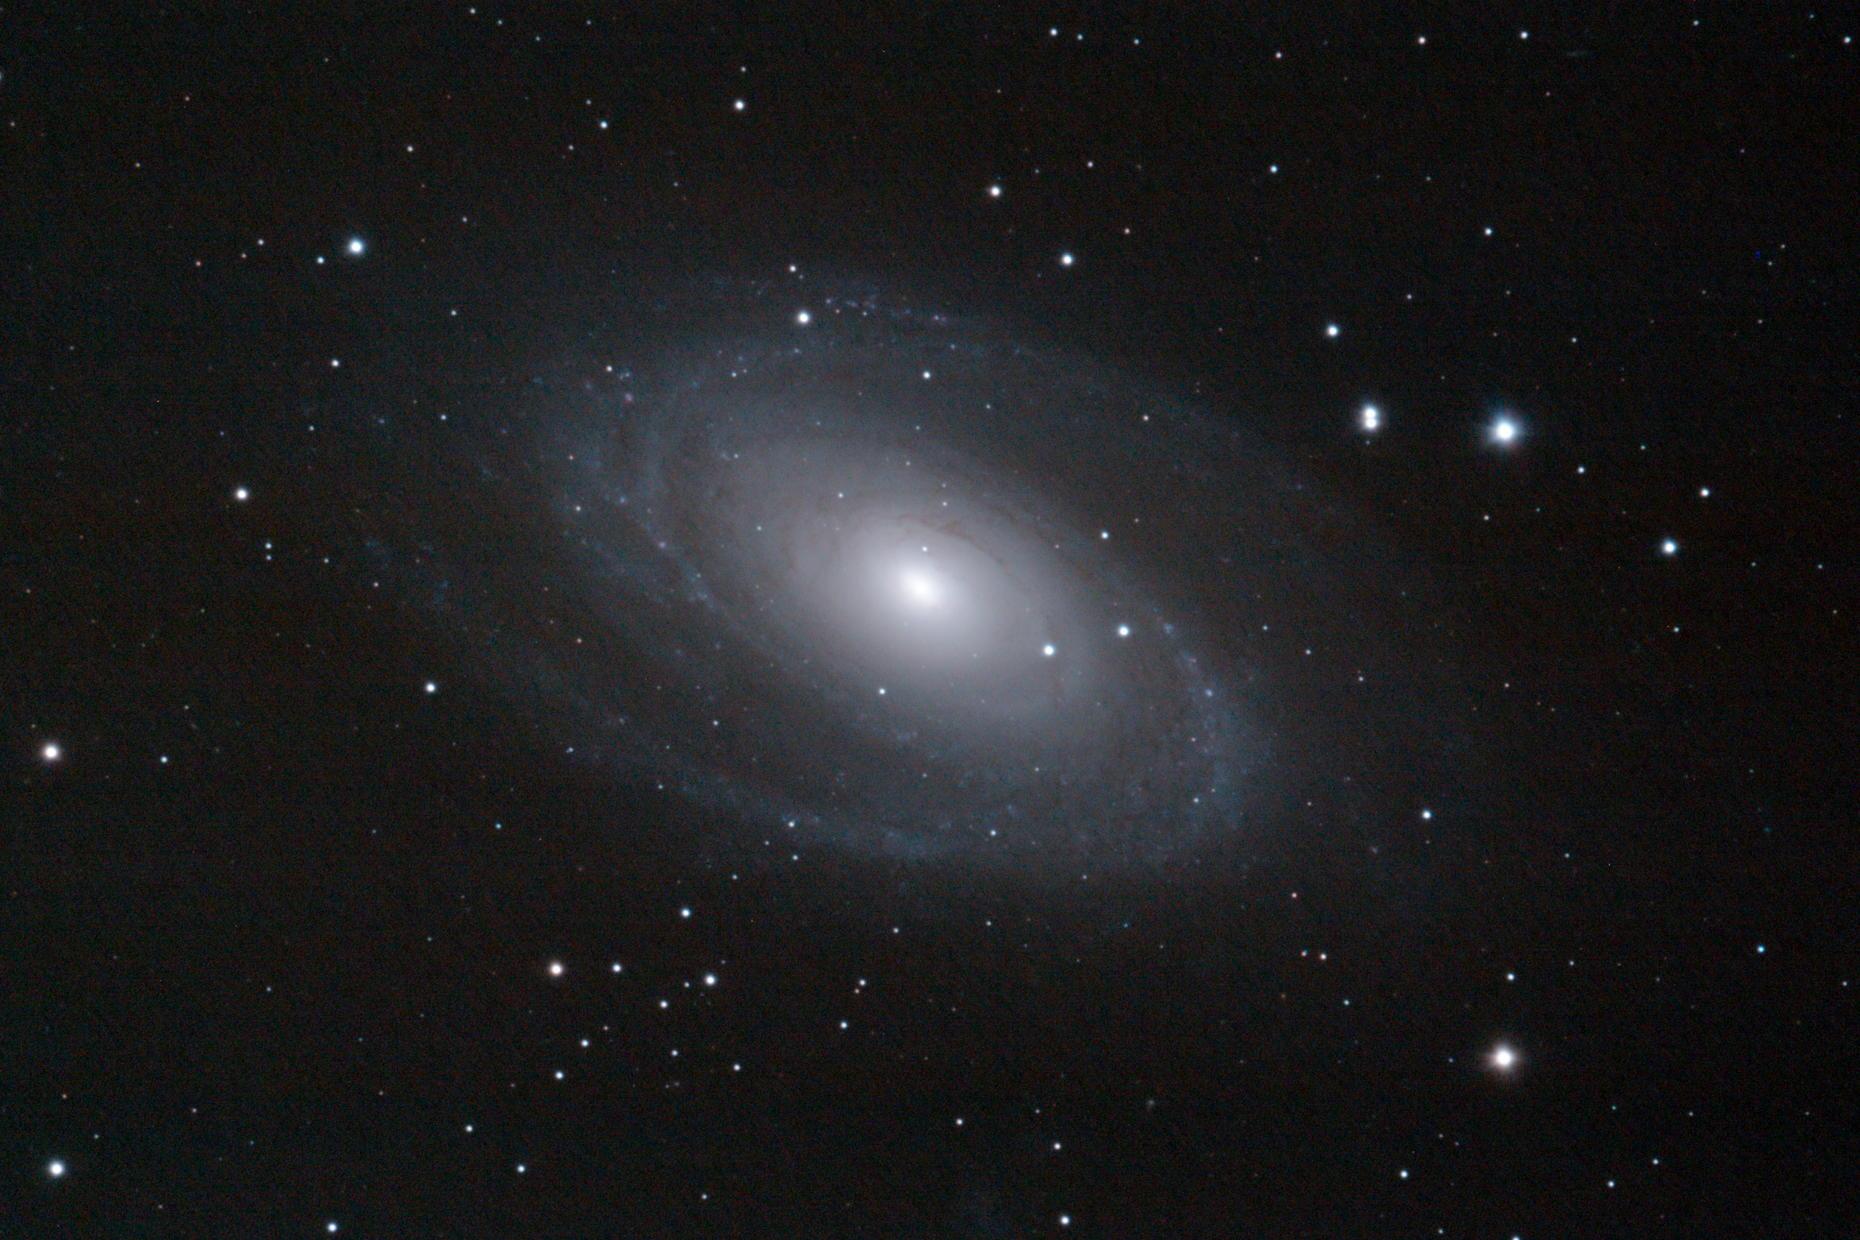 M81 20200314 V1 sd.jpg